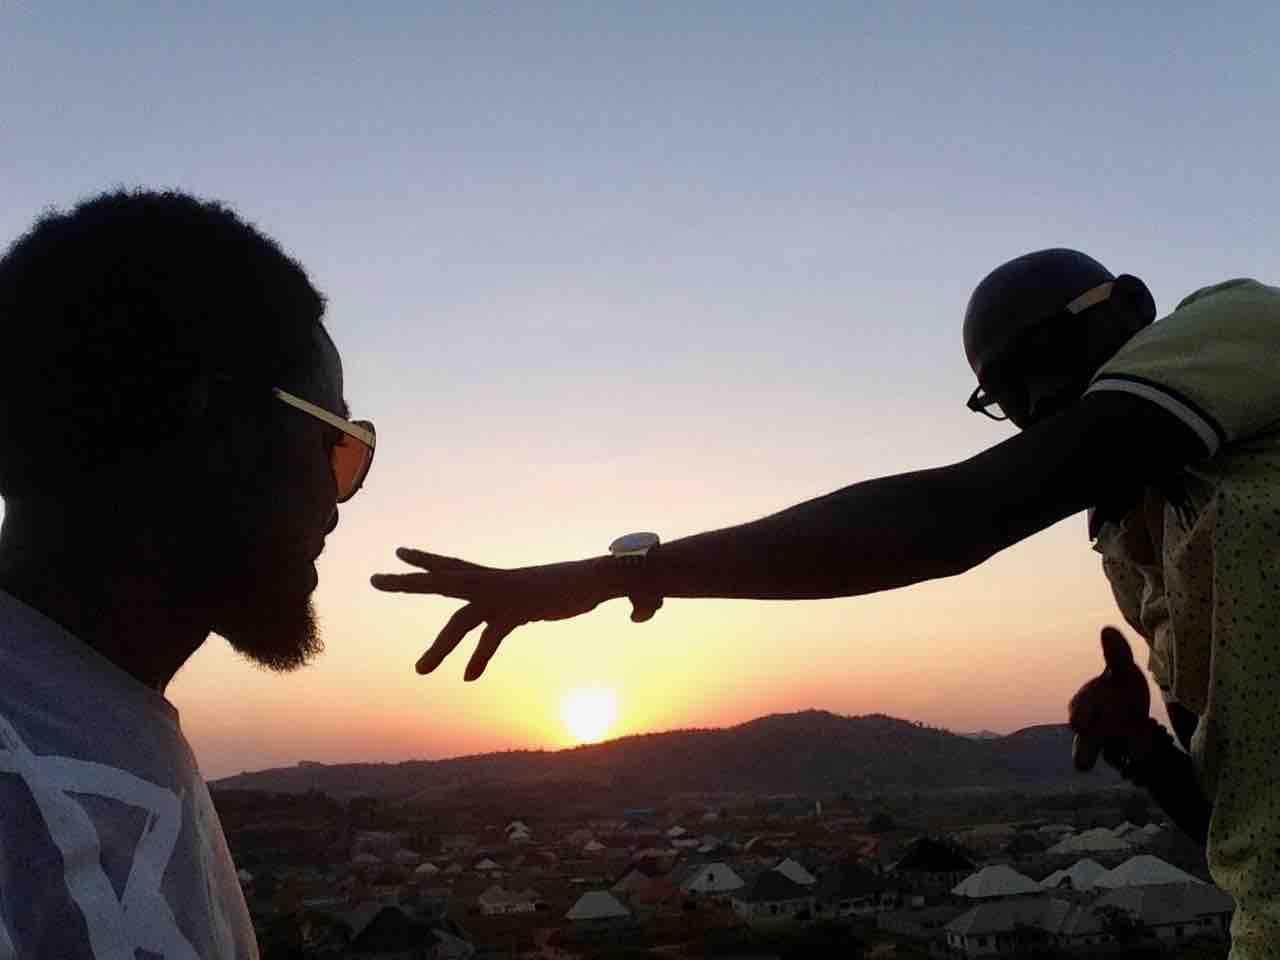 Sunset over Ushafa Village, Abuja, Nigeria. #JujuFilms